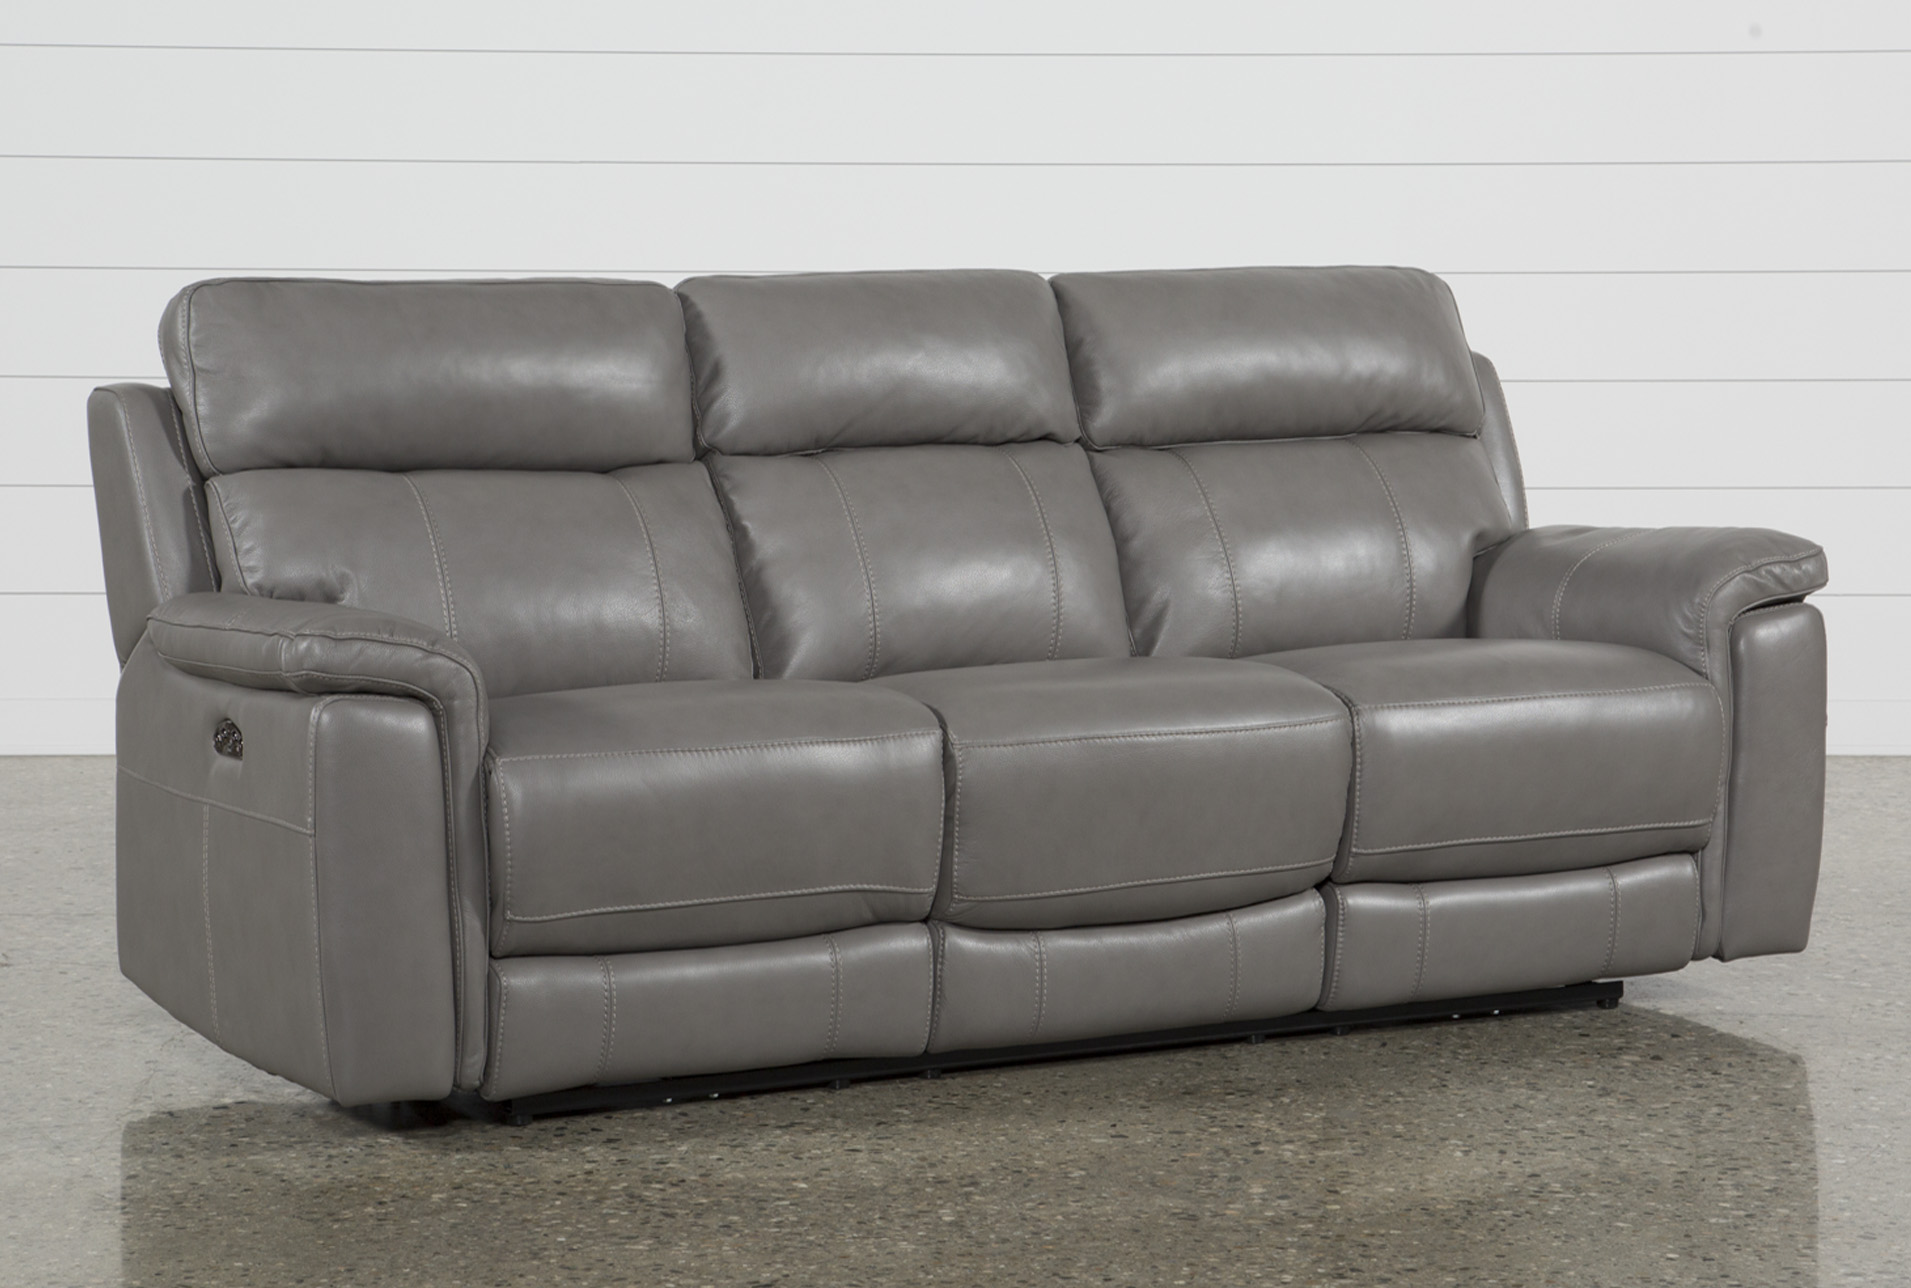 dino grey leather power reclining sofa w power headrest usb rh livingspaces com leather power reclining sofa and loveseat leather power reclining sofa reviews